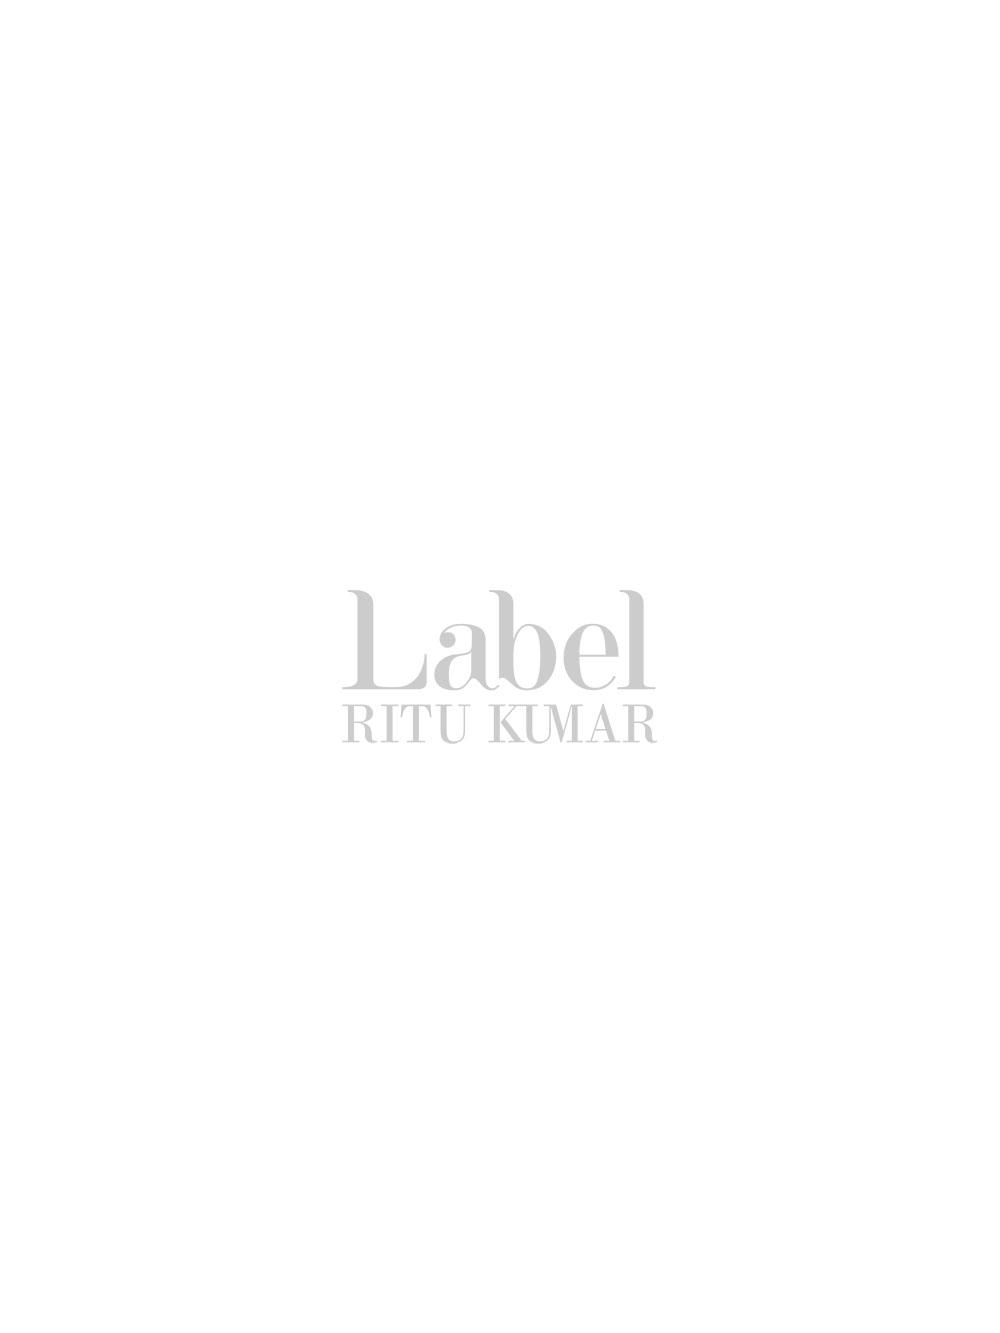 Black Embroidered Vintage Dress By Label Ritu Kumar